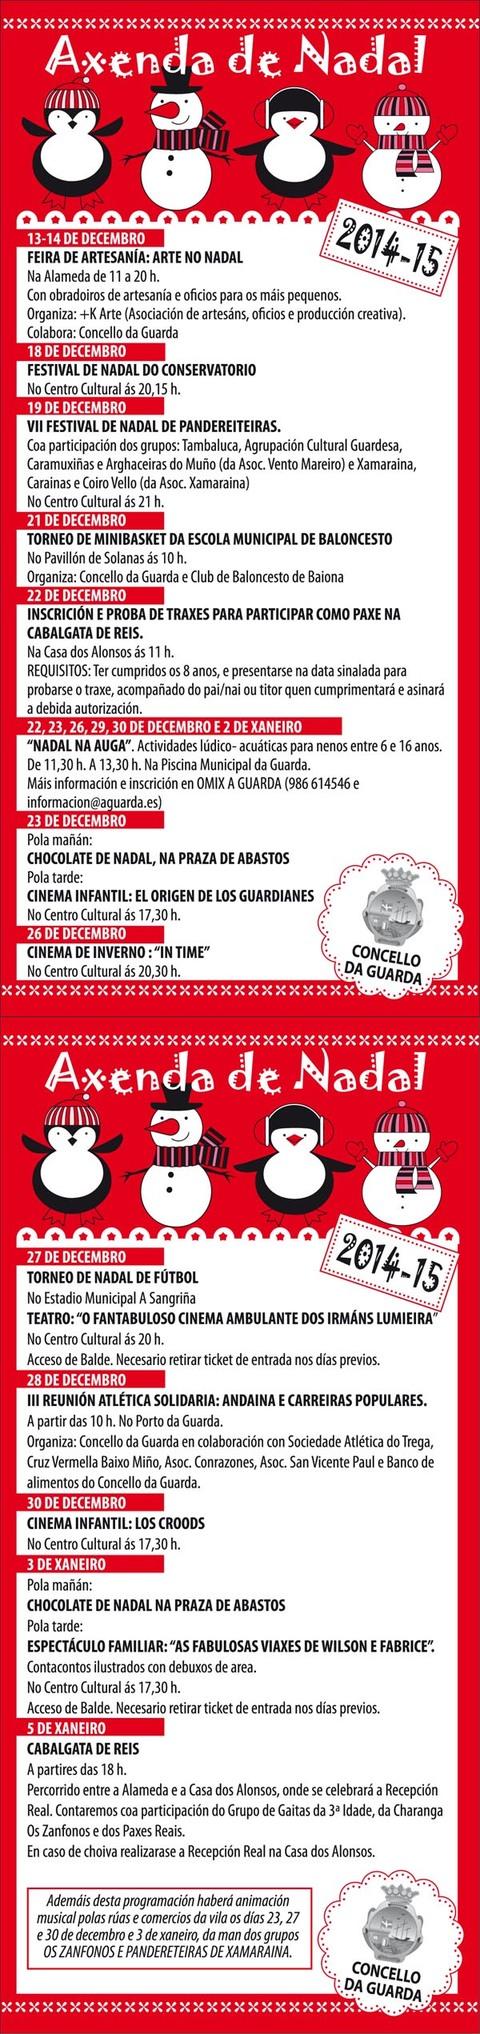 Infominho -  ARRANCA A PROGRAMACI�N DE NADAL NA GUARDA CUN FESTIVAL DE PANDERETEIRAS - INFOMI�O - Informacion y noticias del Baixo Mi�o y Alrededores.